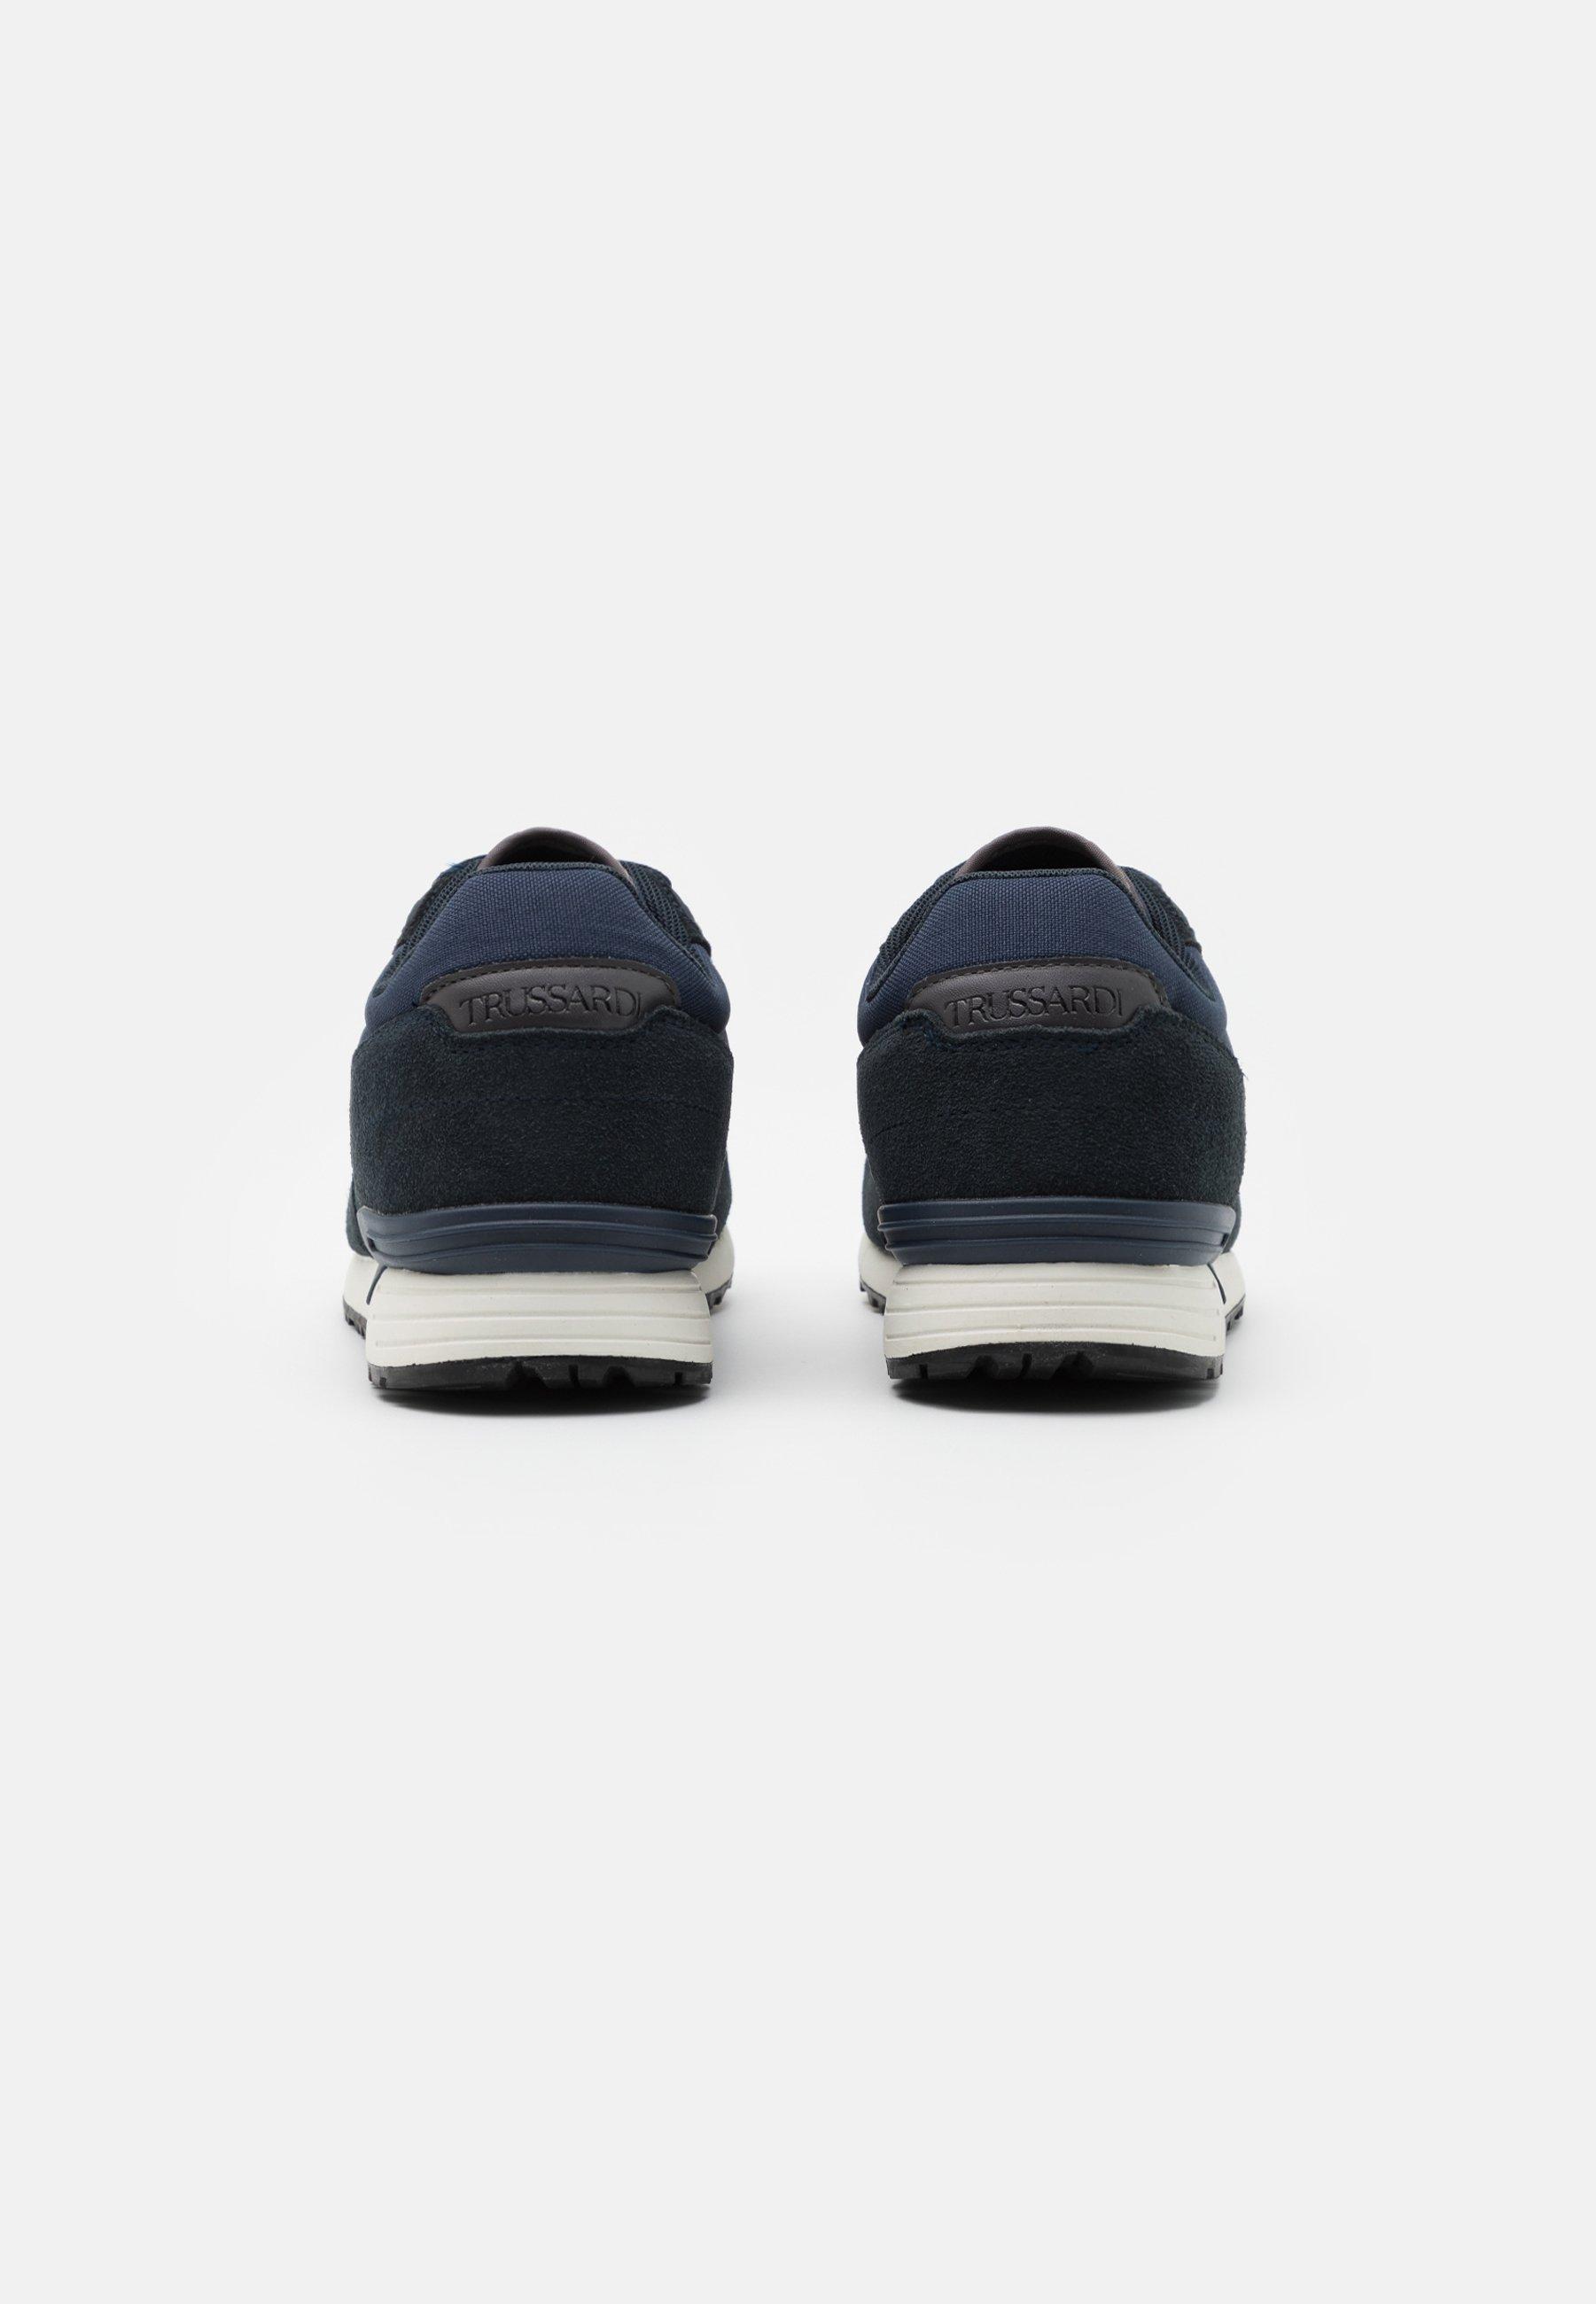 Trussardi PENTAS - Sneaker low - dark blue/dunkelblau - Herrenschuhe SQlqY